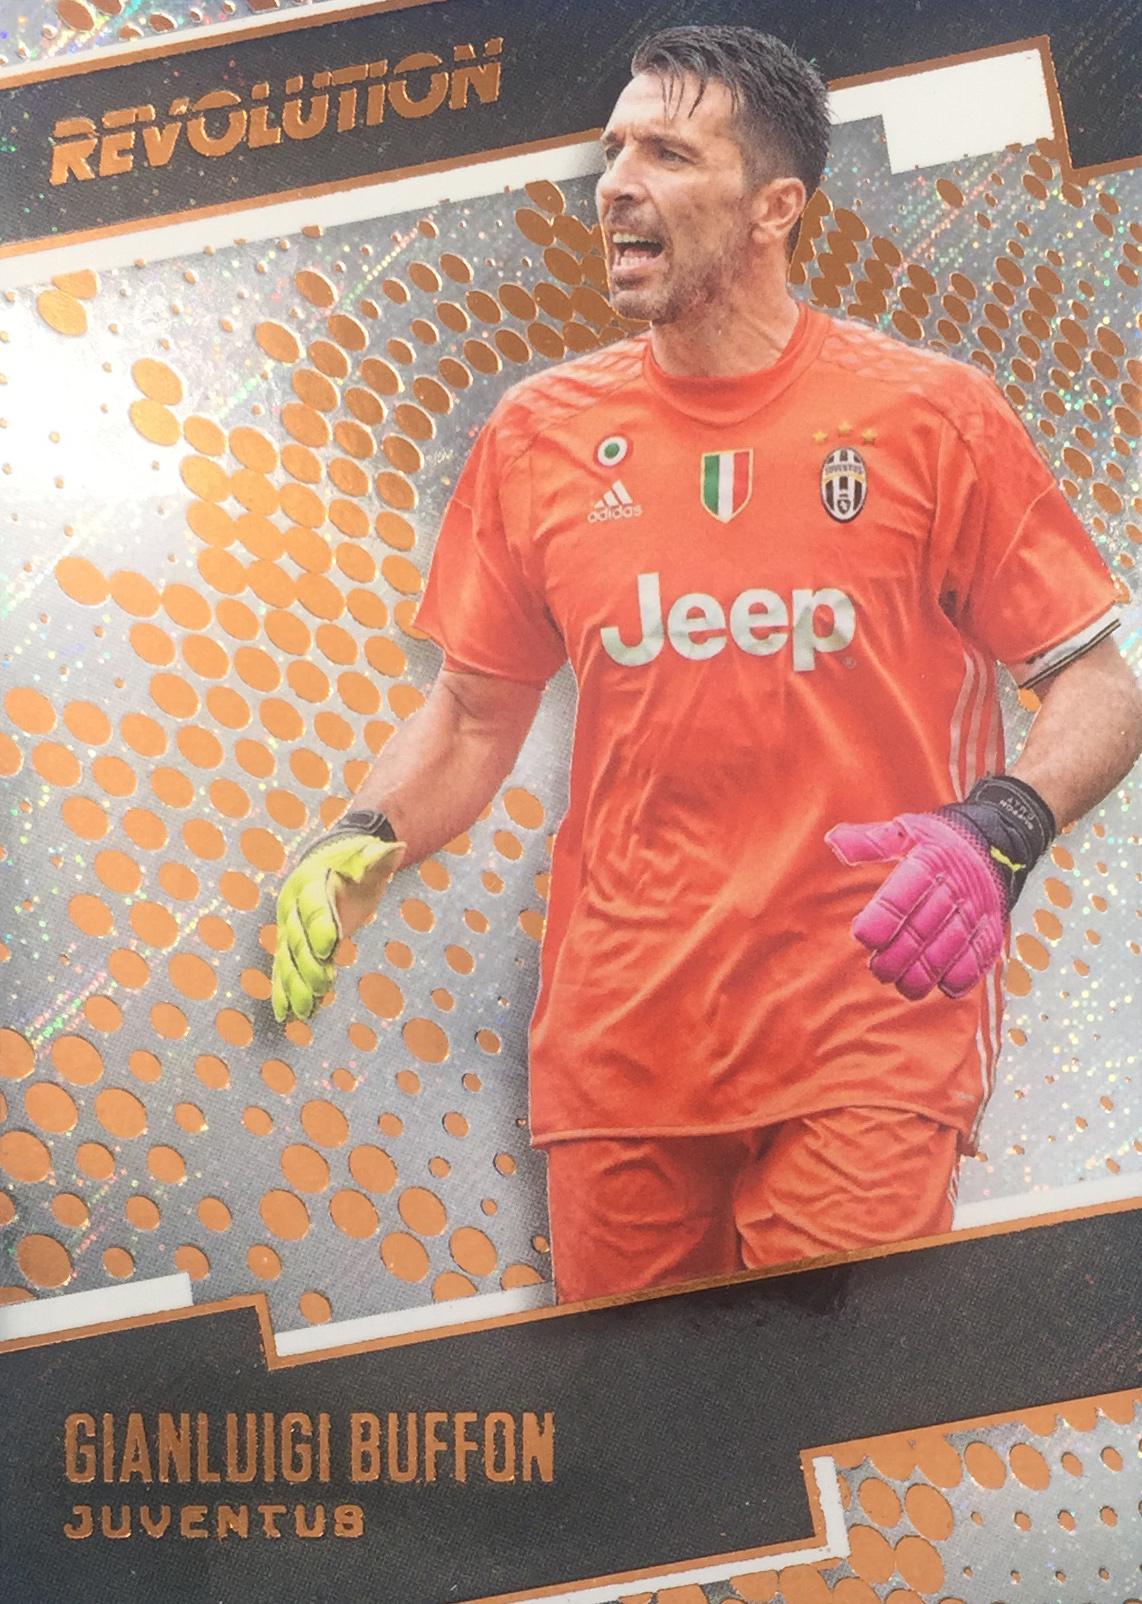 【Ed】 2017 Panini 革命足球 球星卡 吉安路易吉·布冯 Gianluigi Buffon 尤文图斯 NO.37凑套补齐